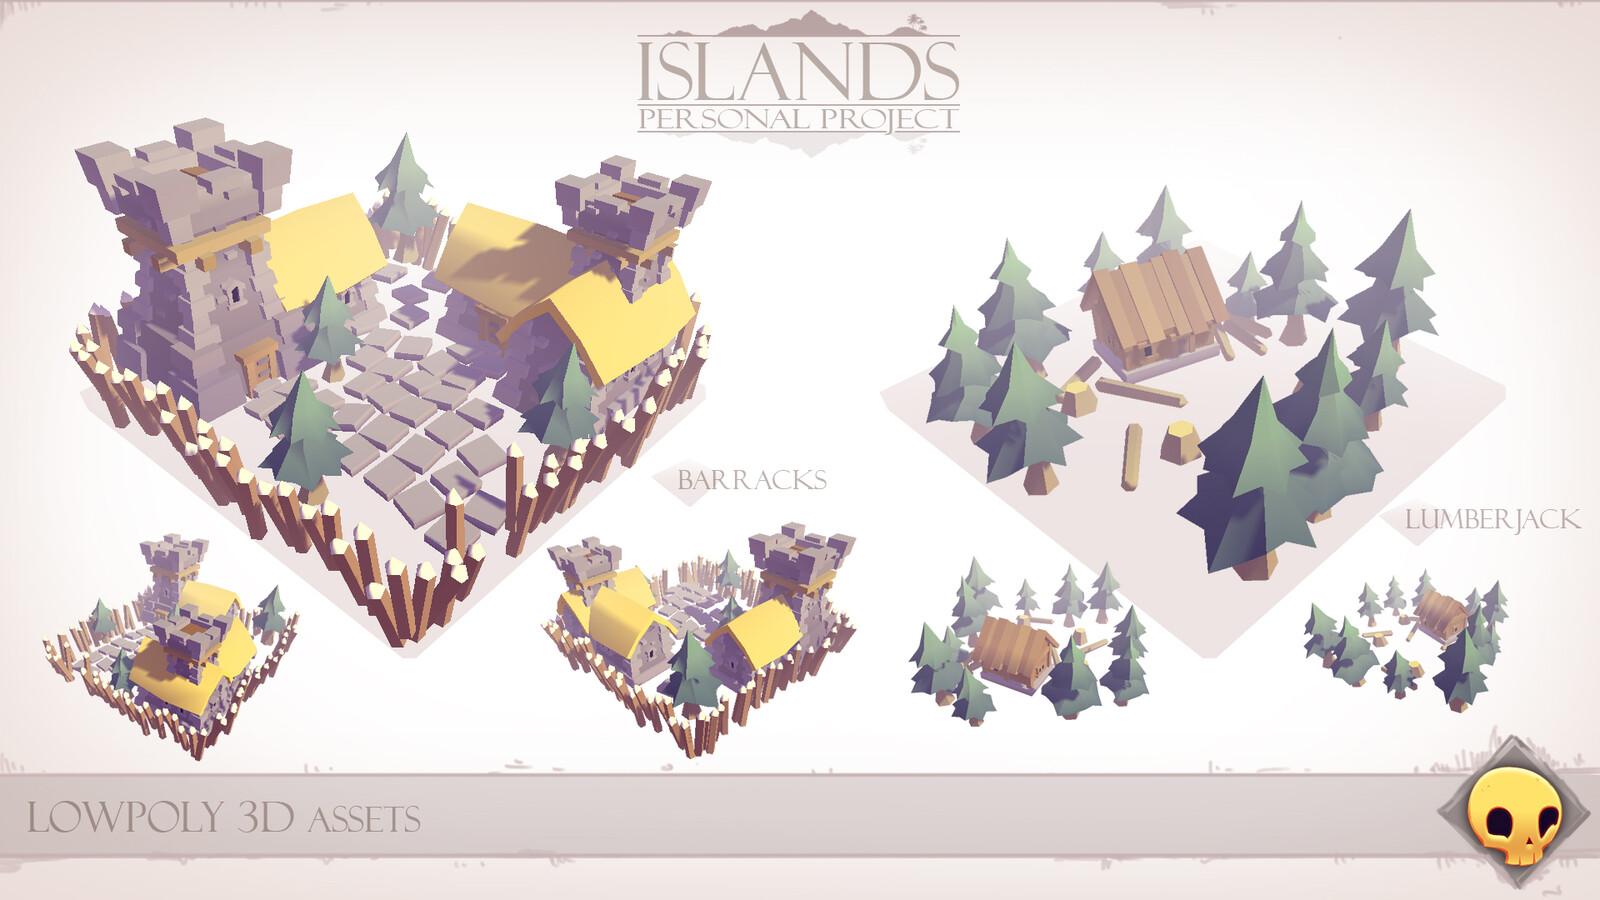 Lowpoly 3D Assets - Barracks & Lumberjack